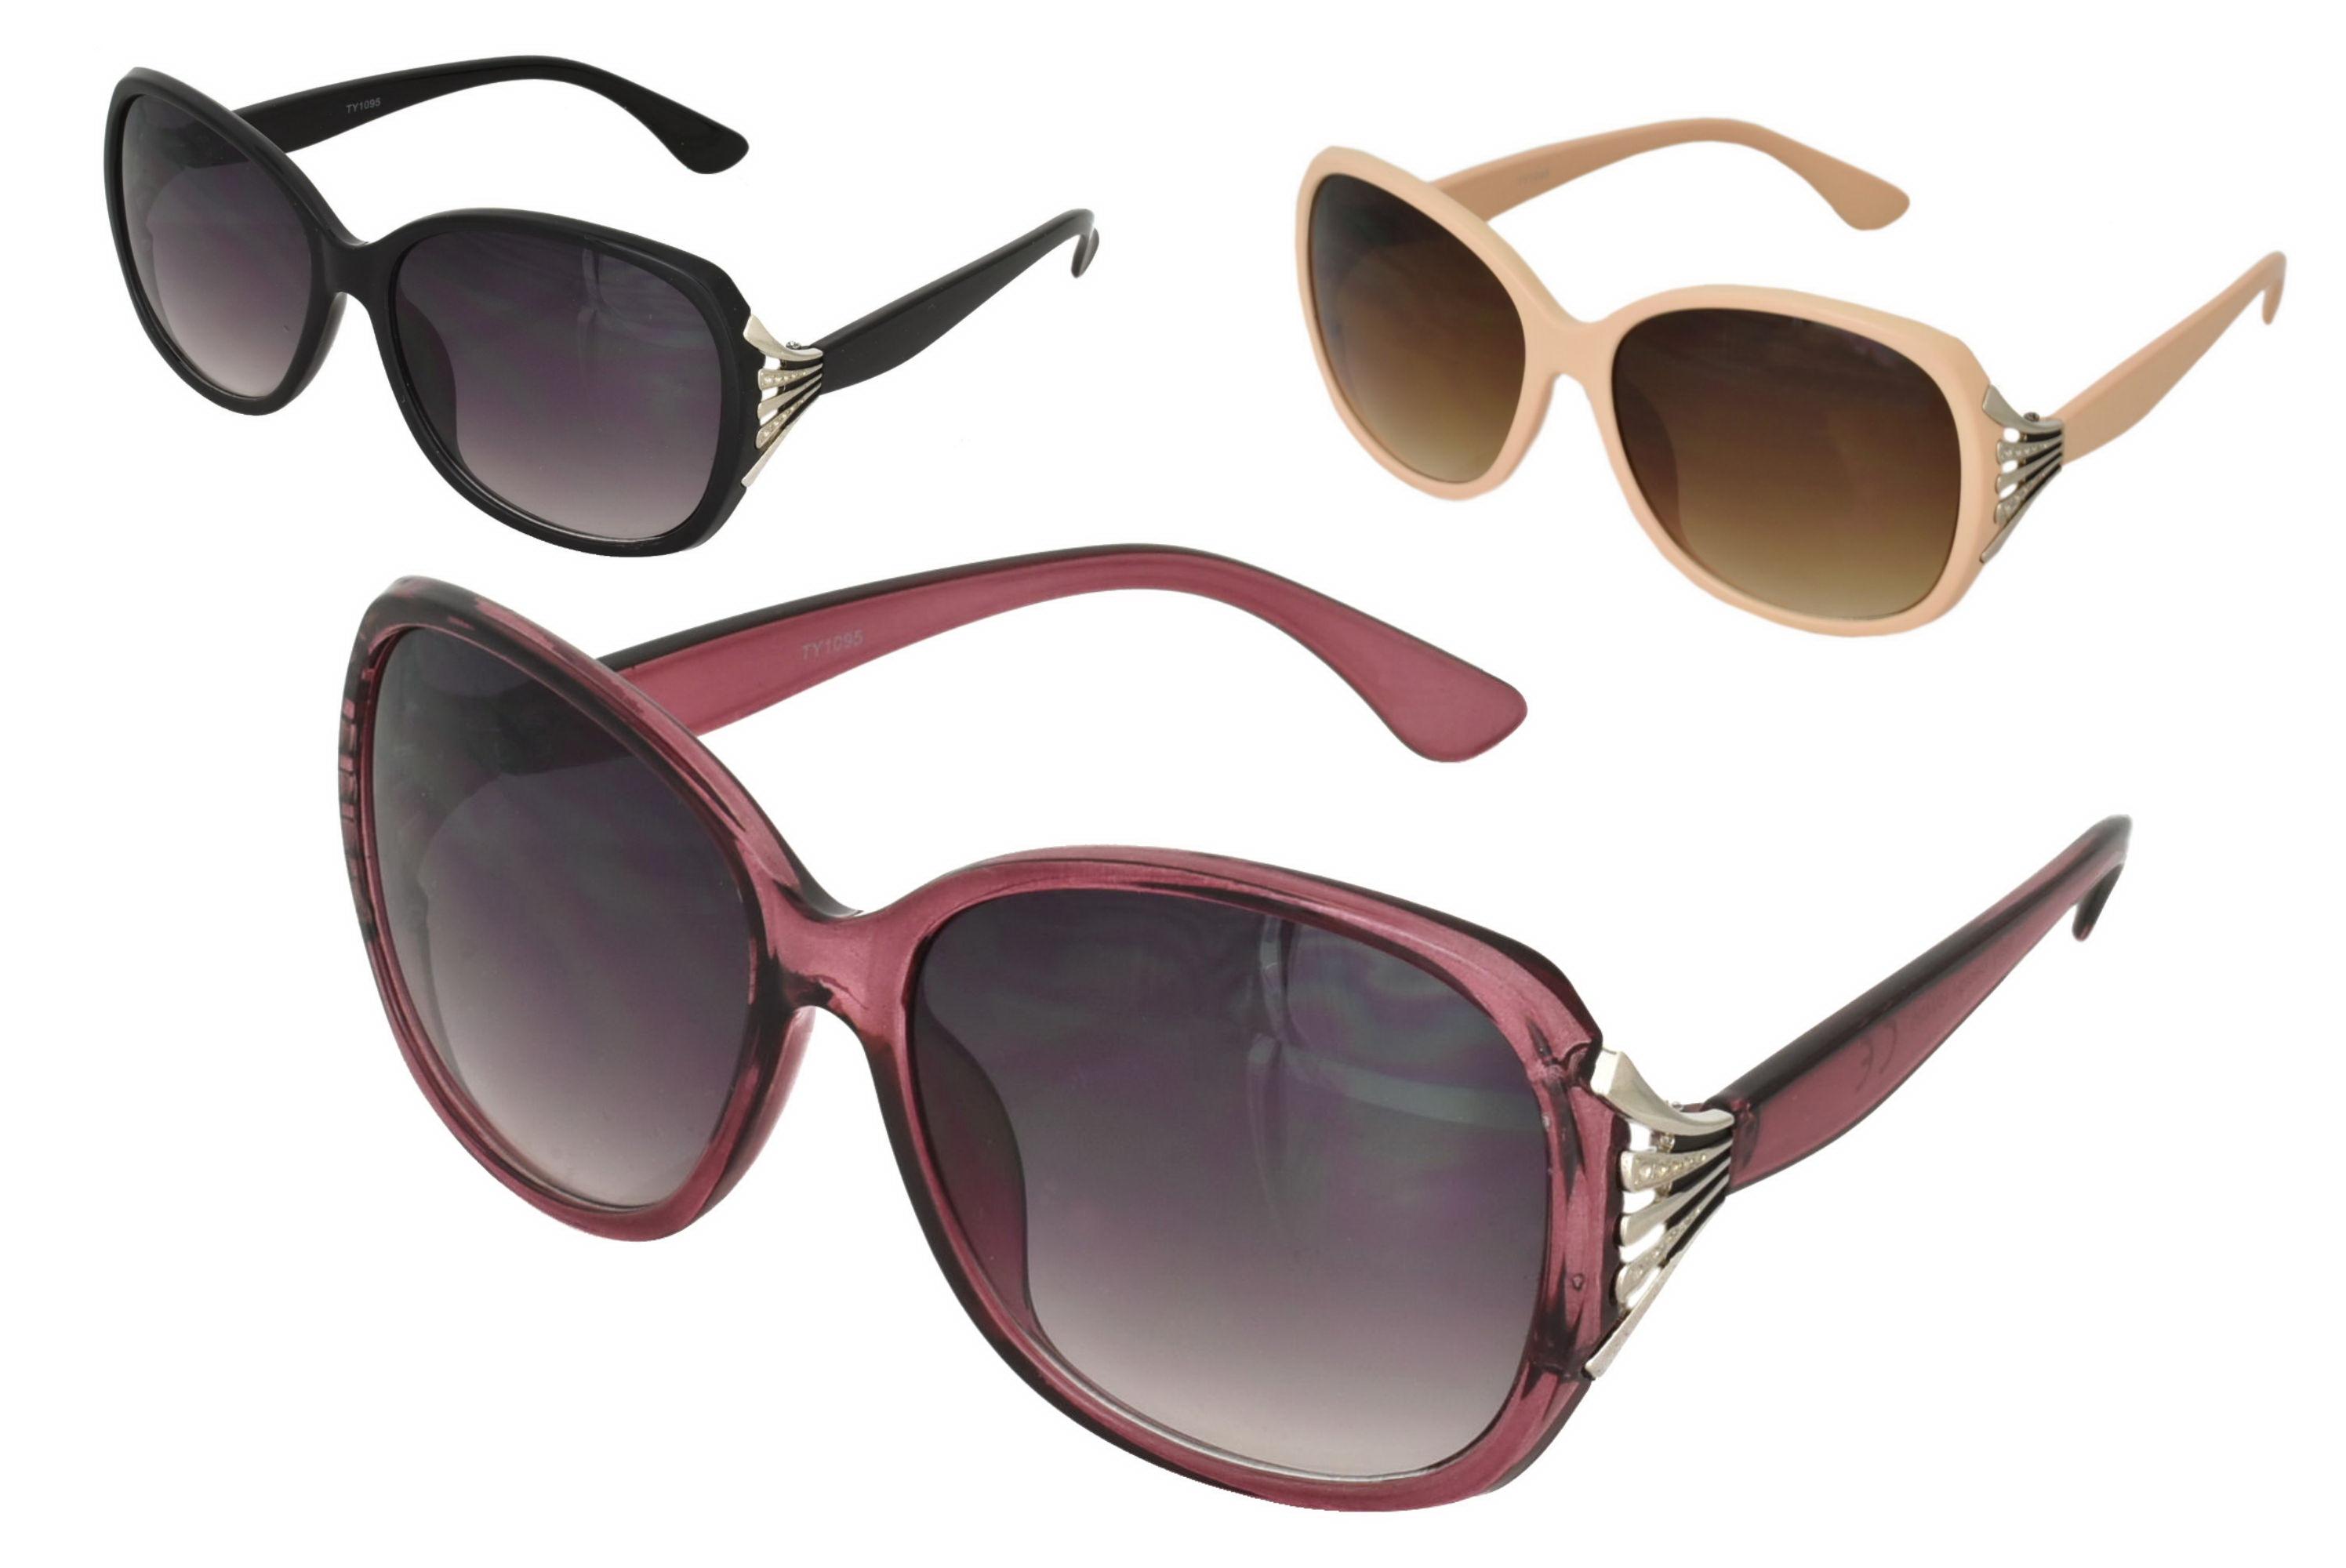 Ladies Plastic Larger Lense Designer Sunglasses 3 Asst